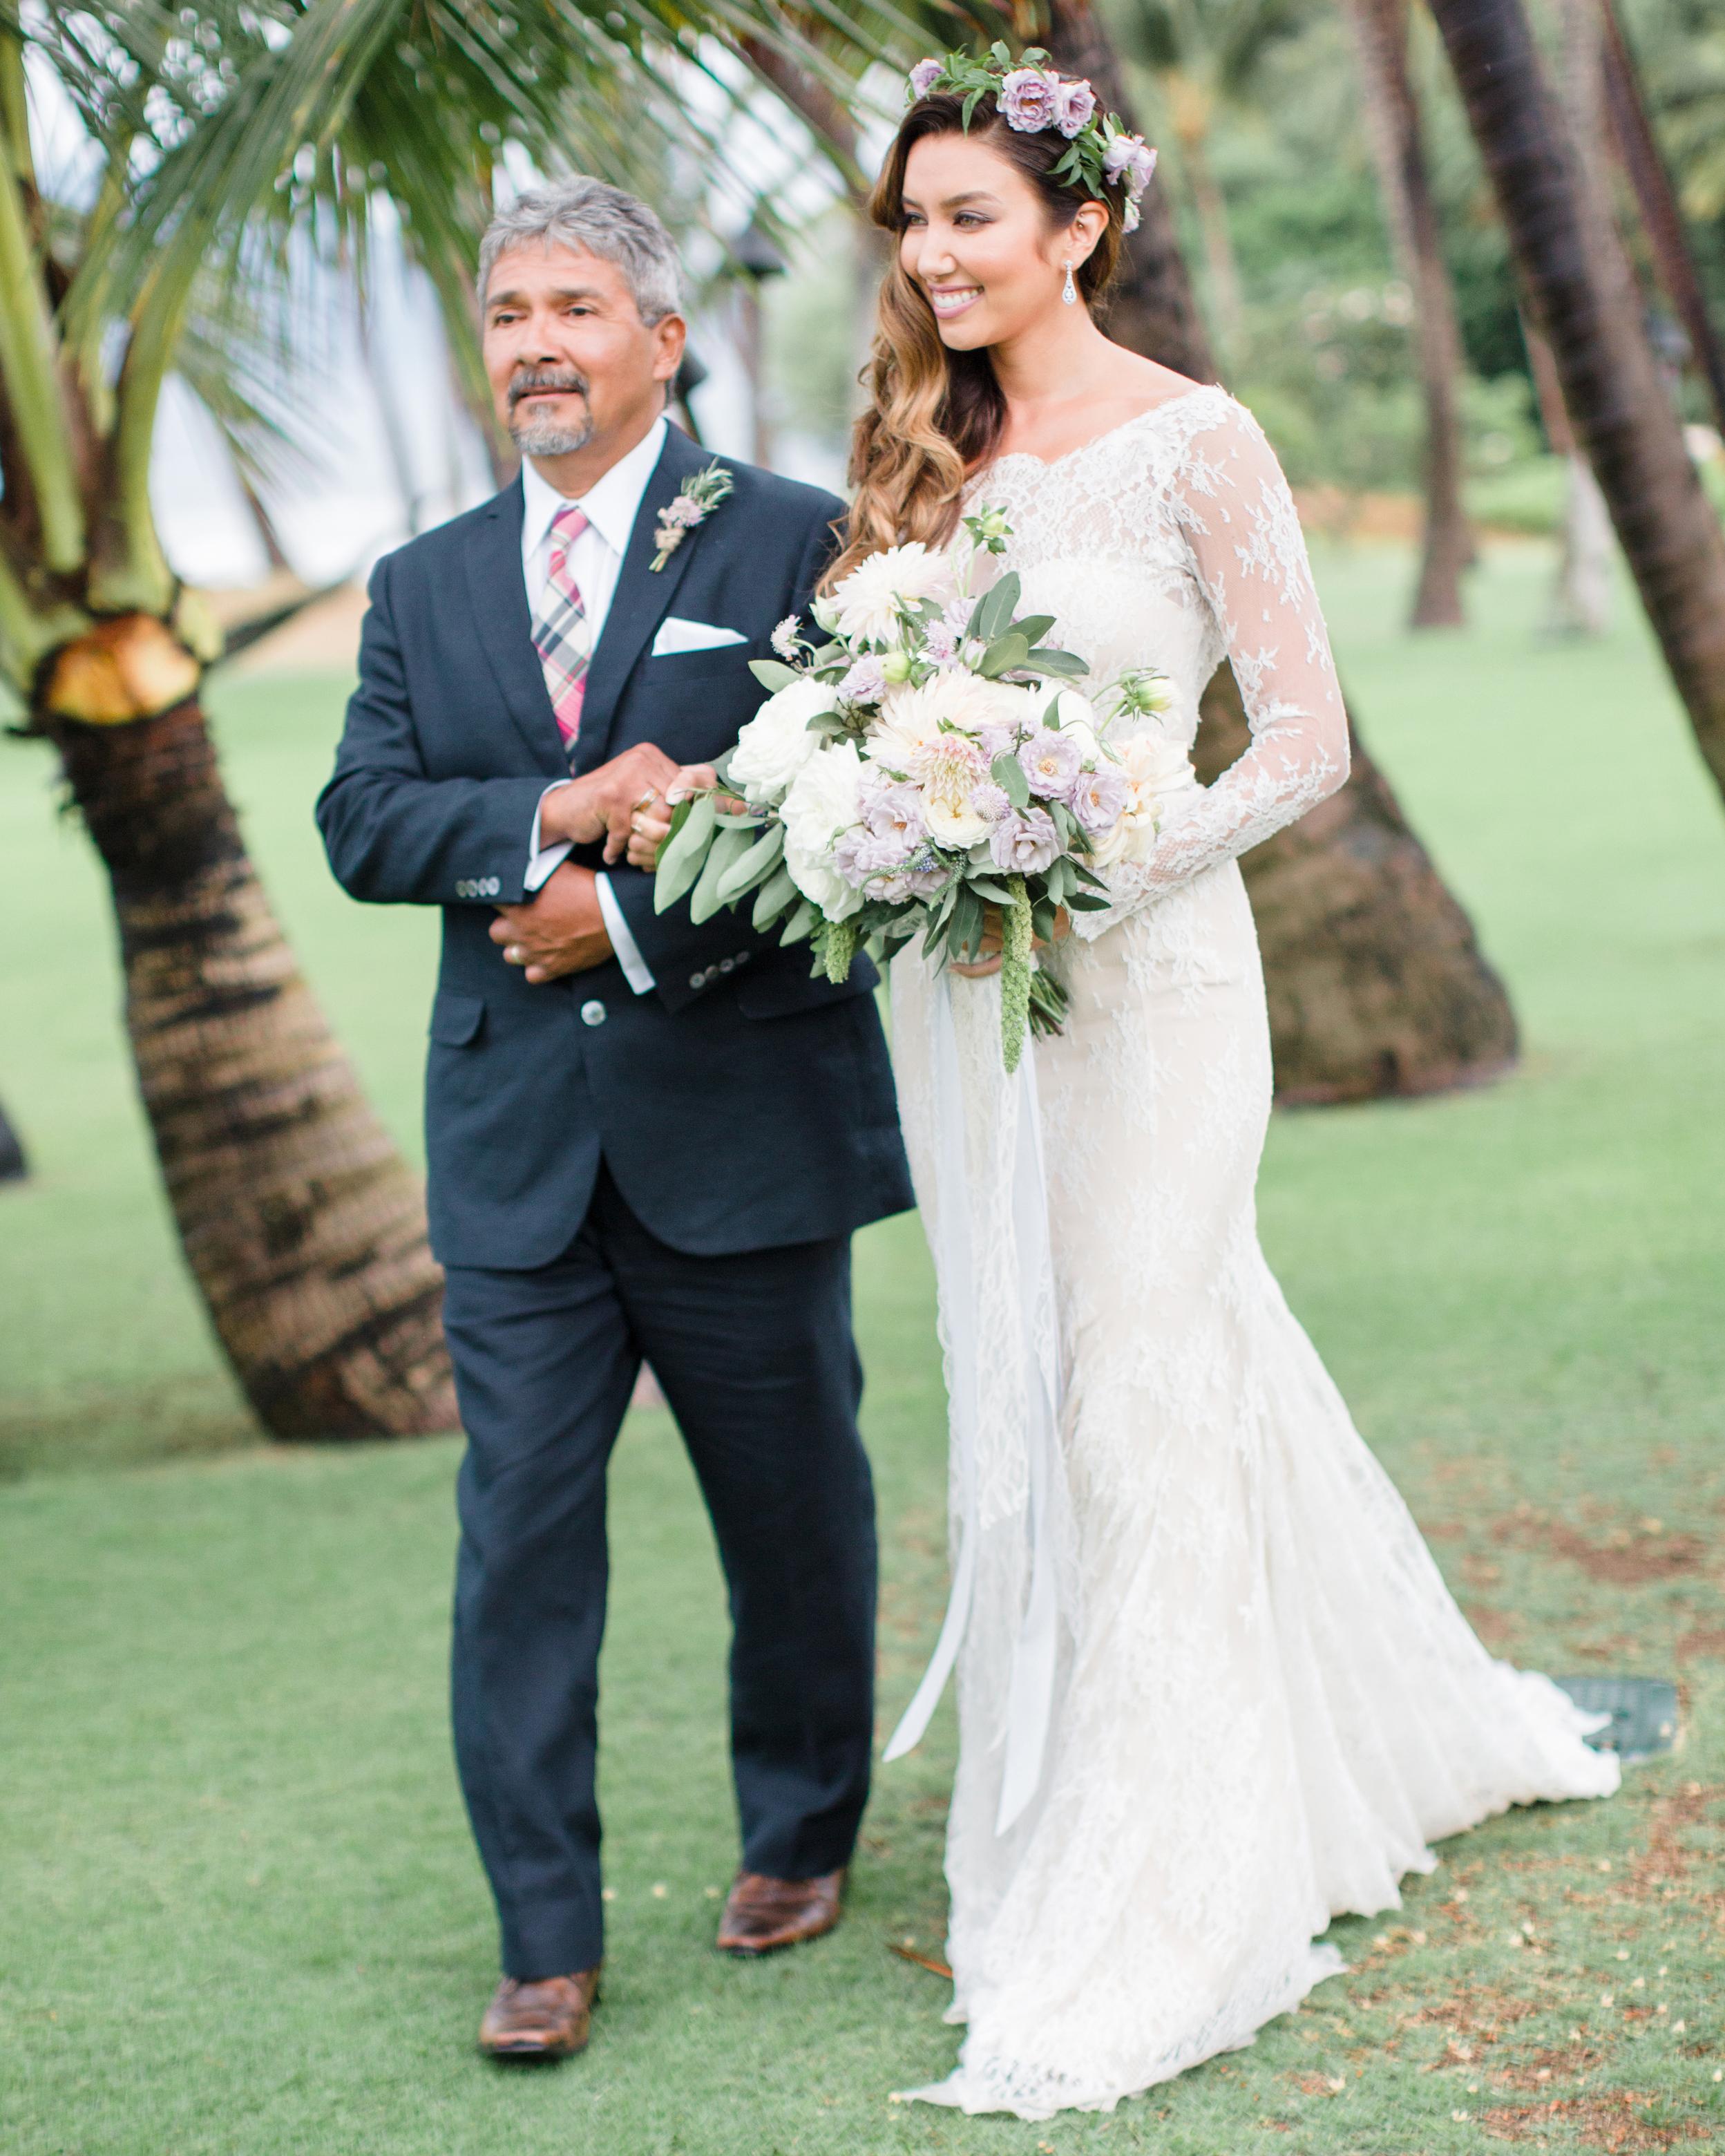 renee-matthew-wedding-maui-hawaii-morison-024-s111851.jpg